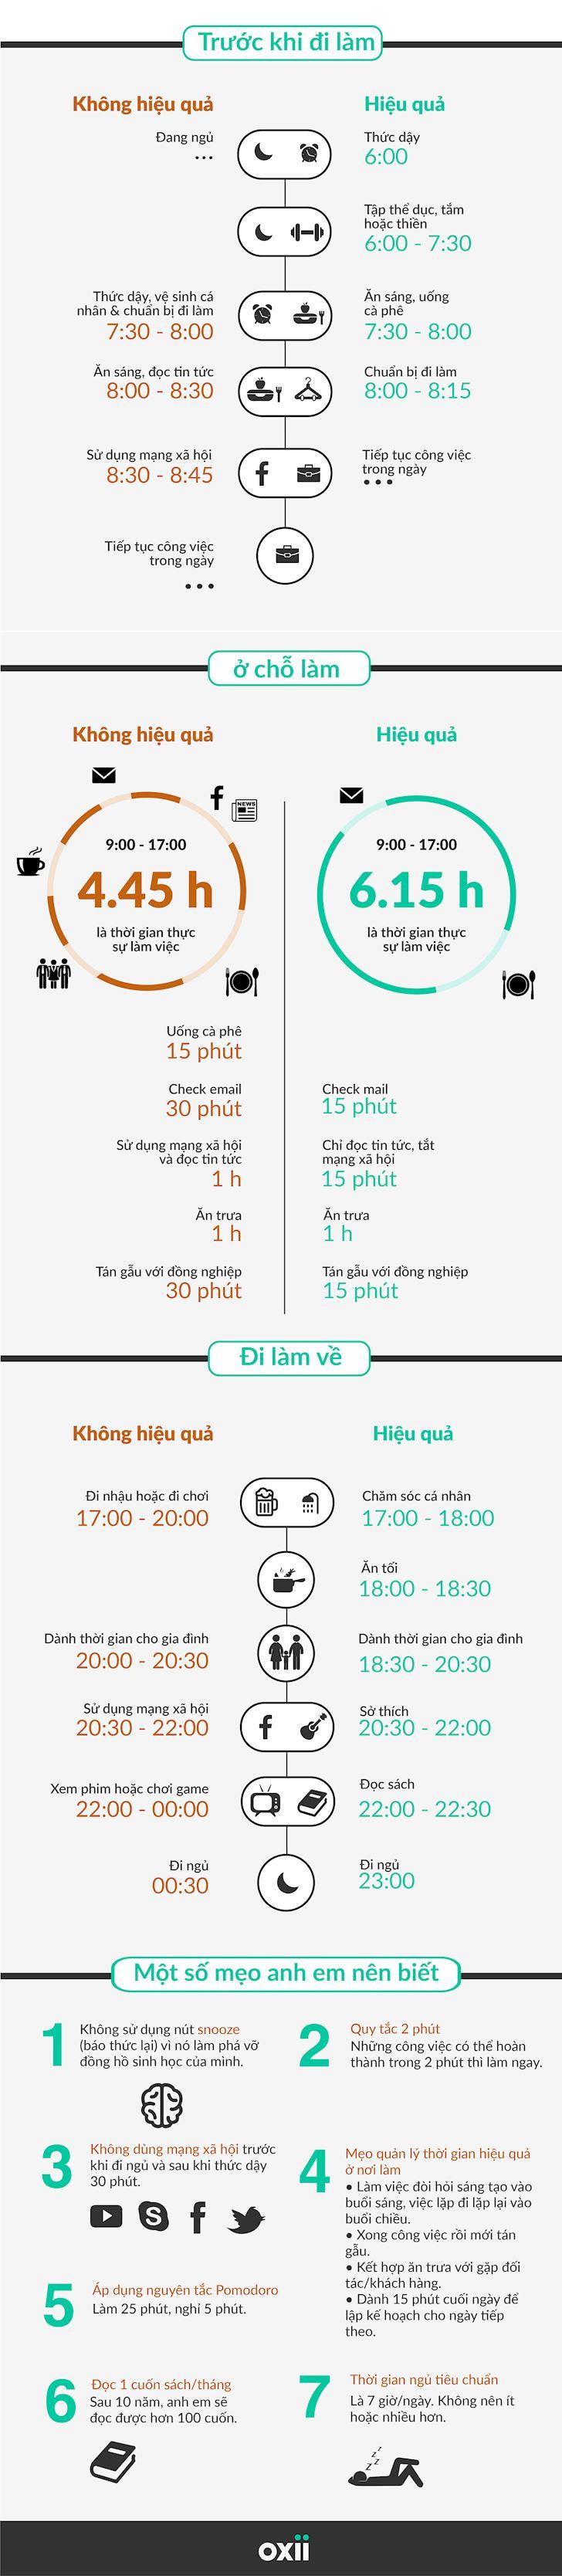 Infographic] Cach quan ly thoi gian thong minh cho nguoi dan ong ban ron